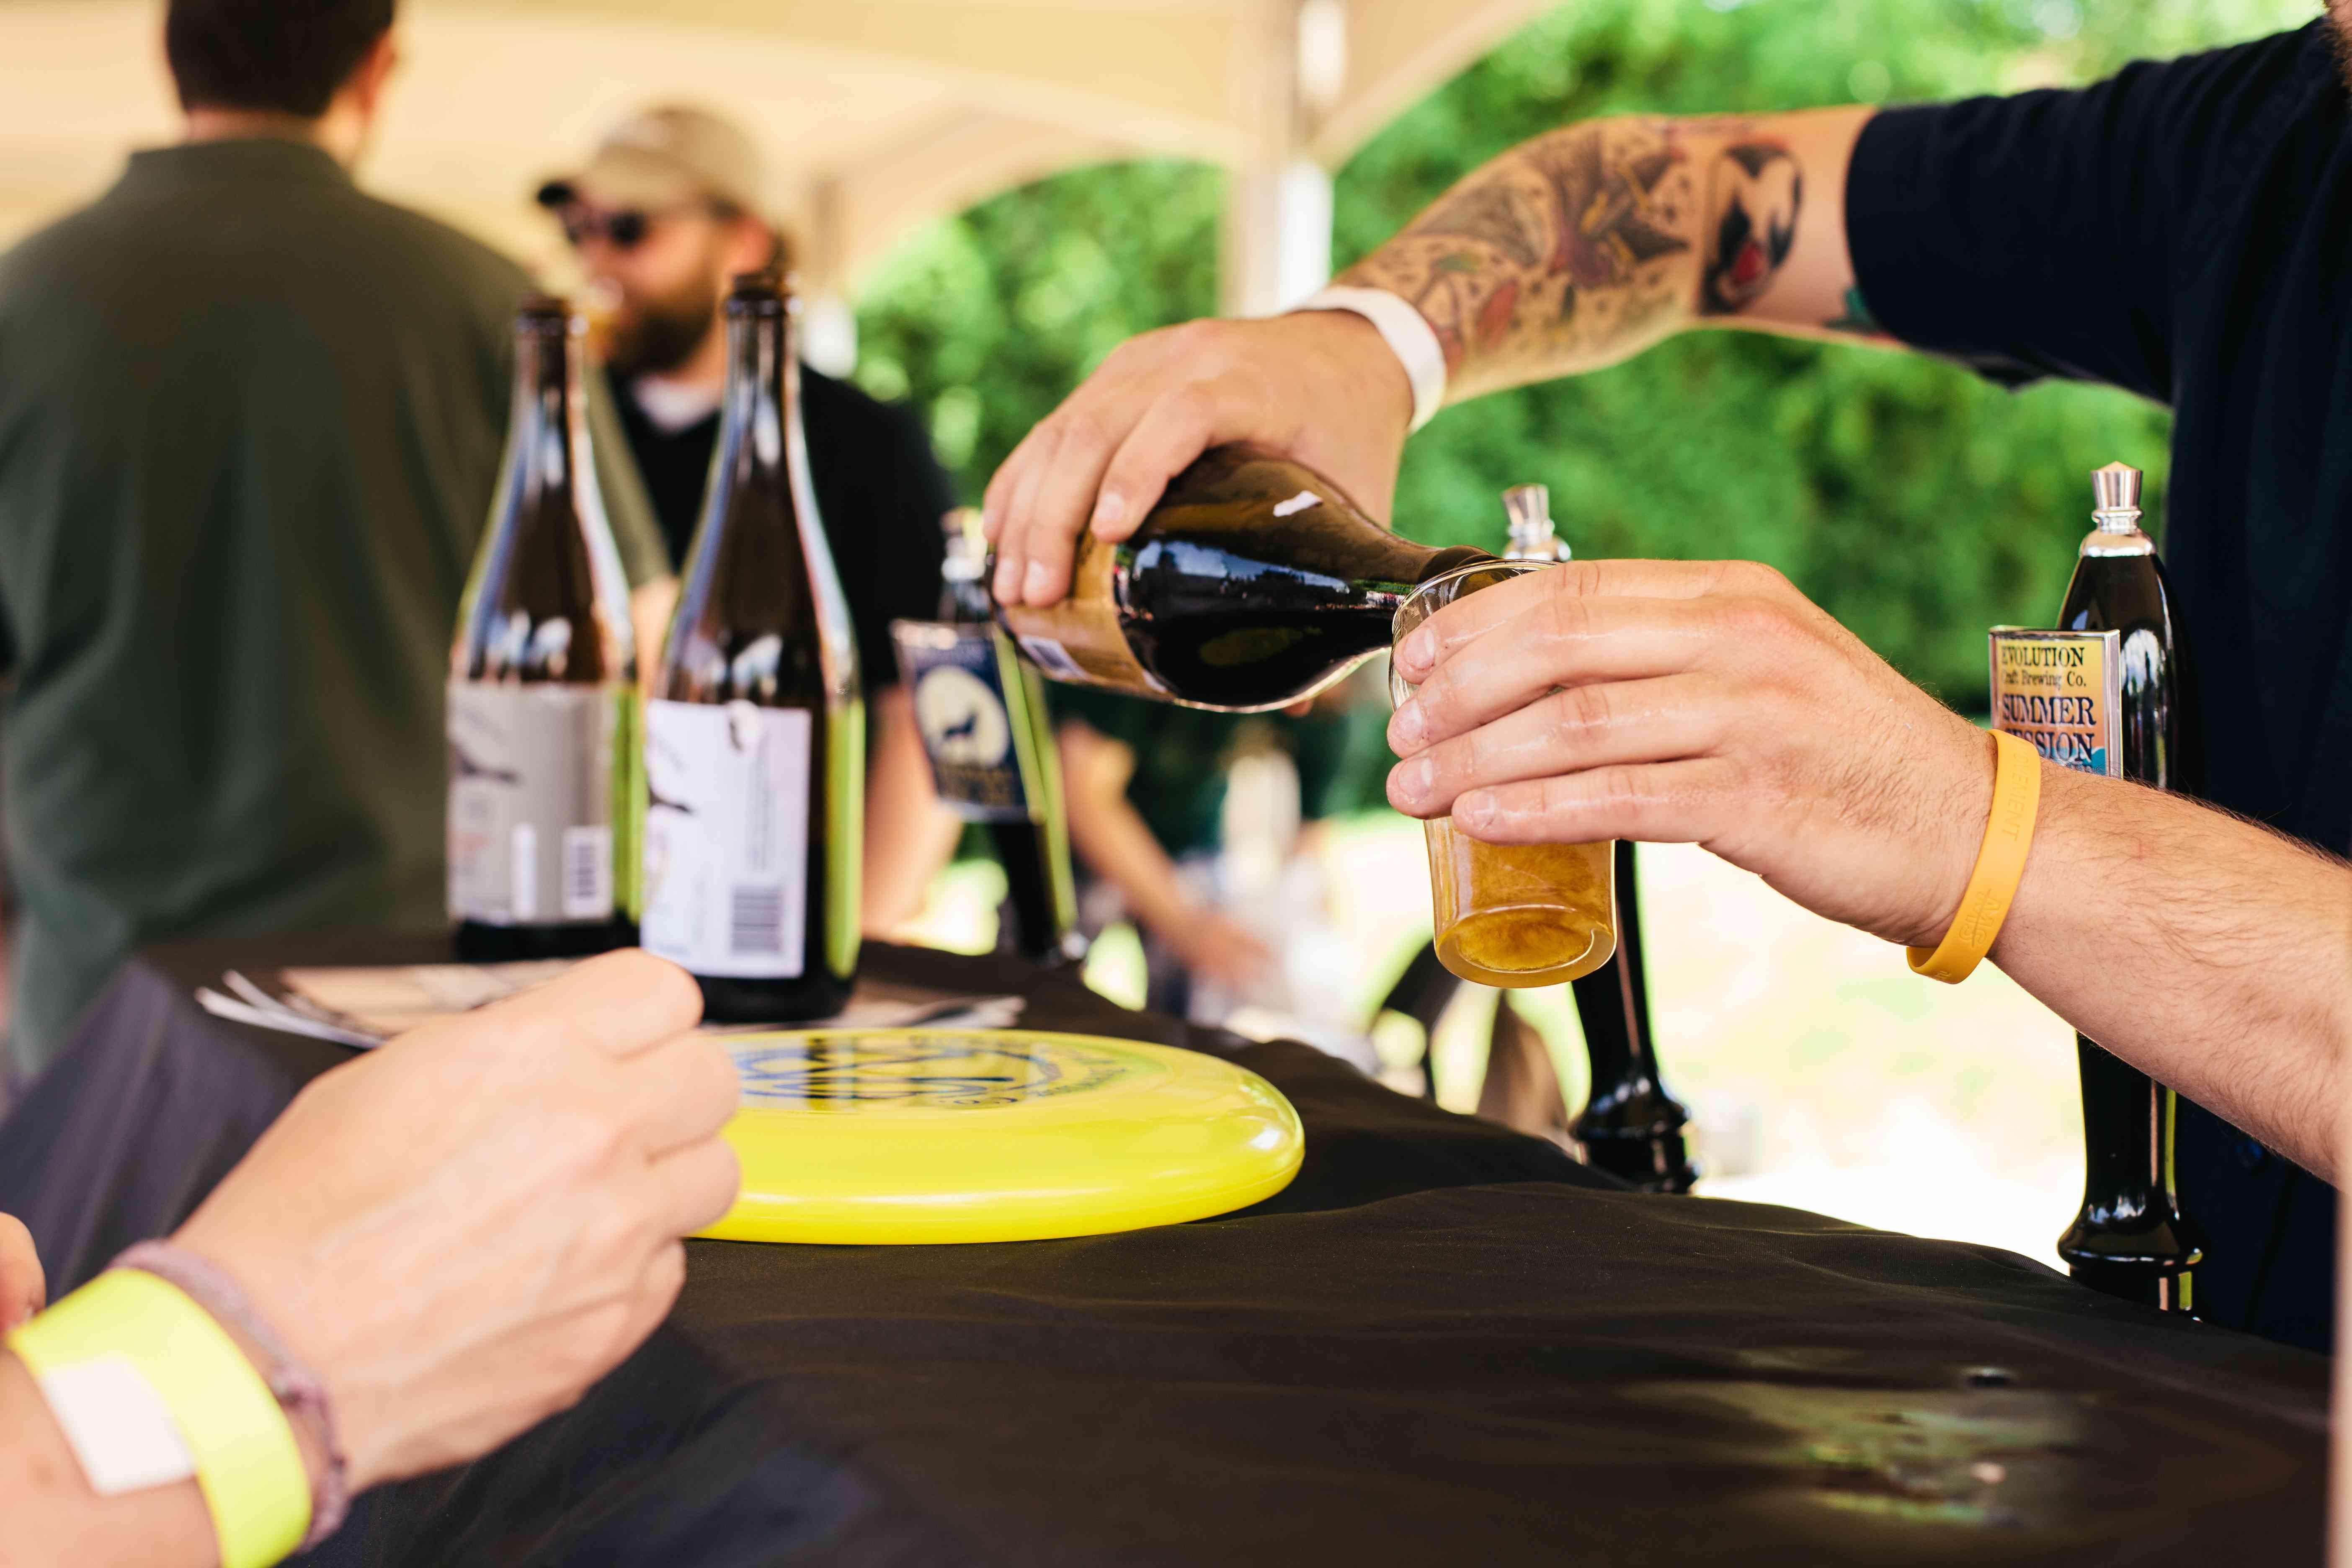 Bertender pouring beer